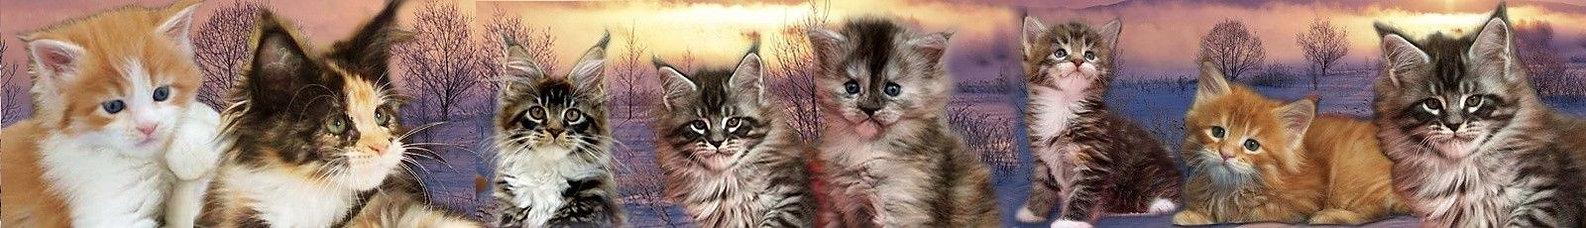 chatons maine coon Cartoonland